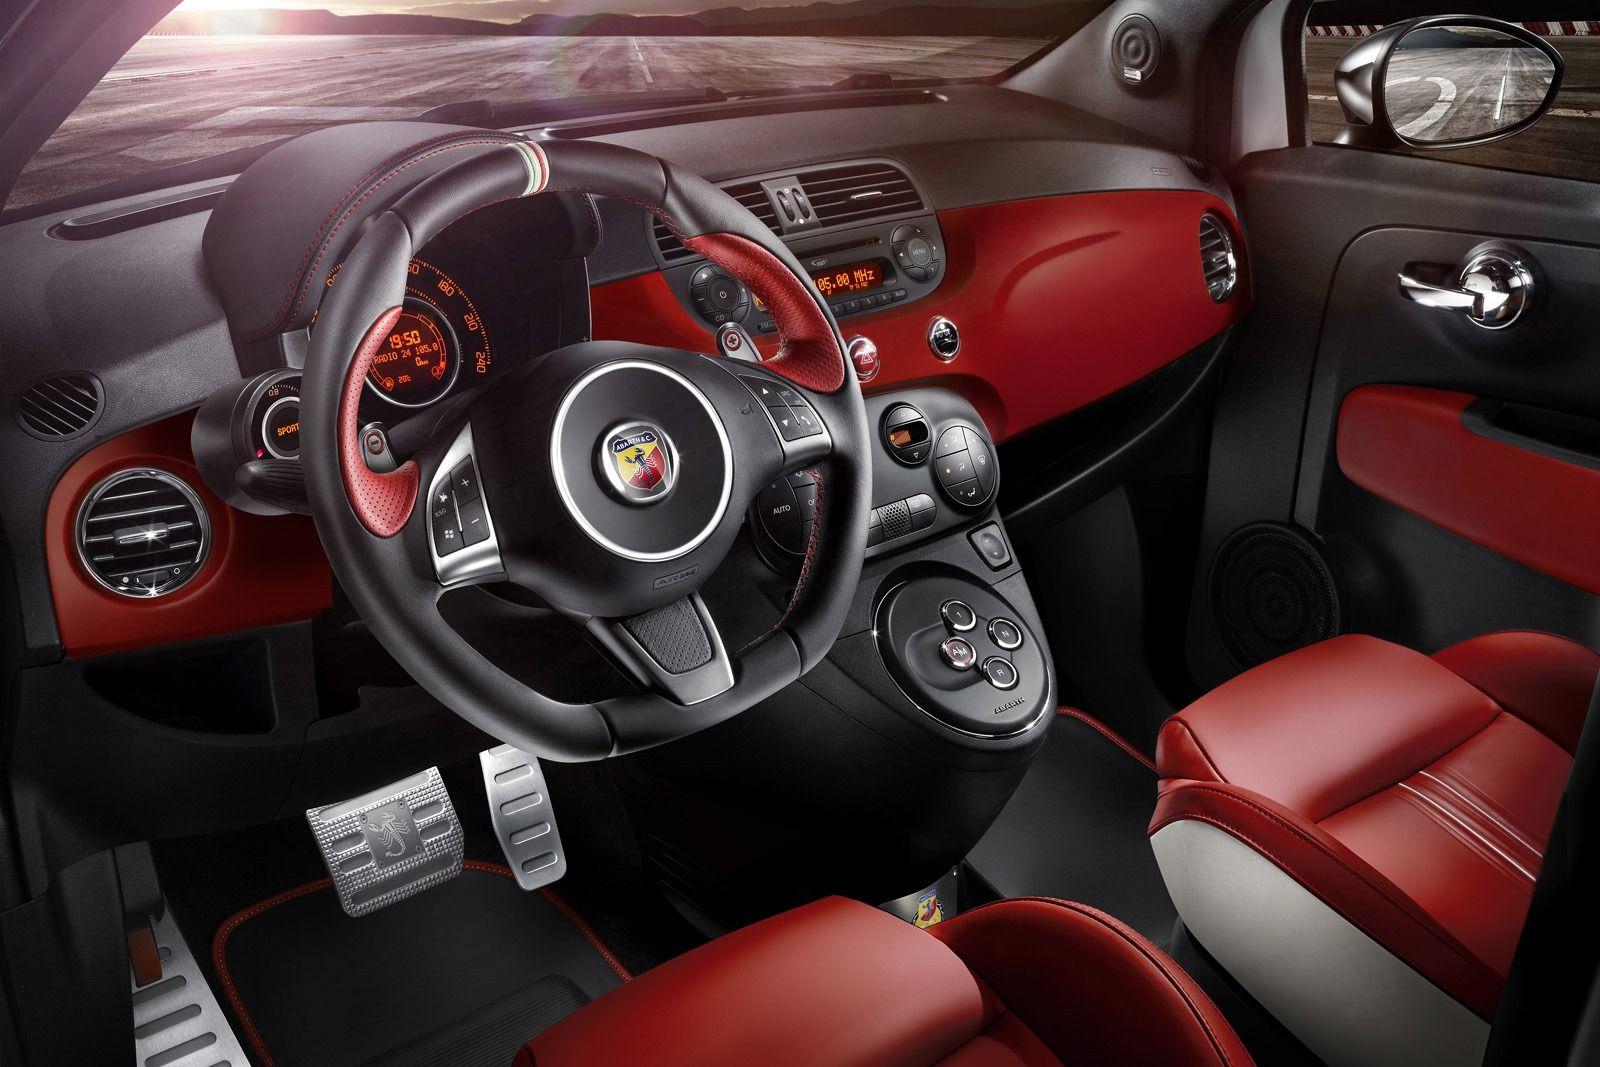 Best Fiat 500 Abarth Interieur Gallery - Ideeën Voor Thuis ...